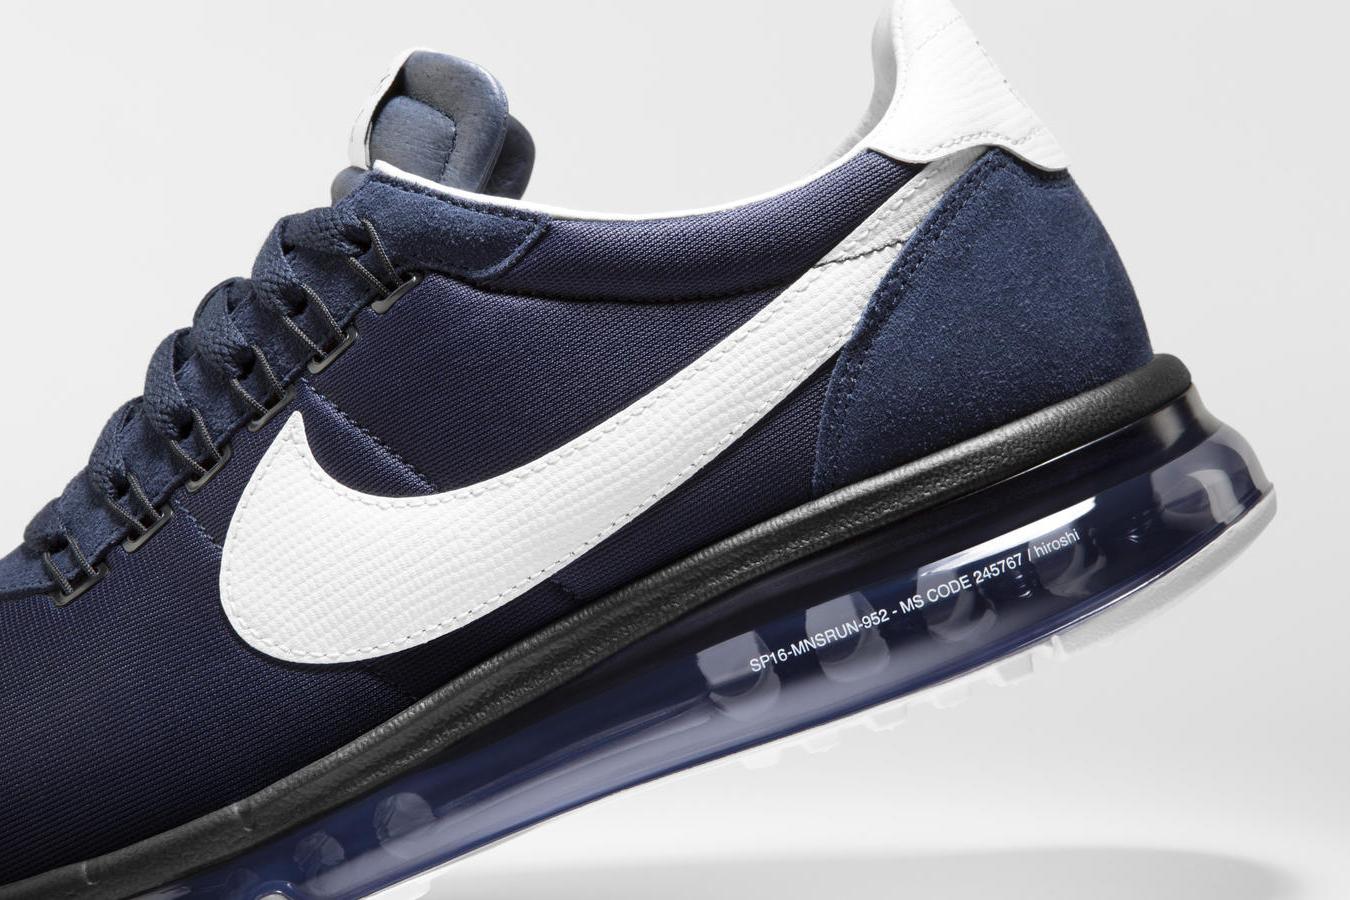 cf2e4fa2f44f7 Hiroshi Fujiwara Designed A New Shoe For Air Max Day – Vintage Media ...